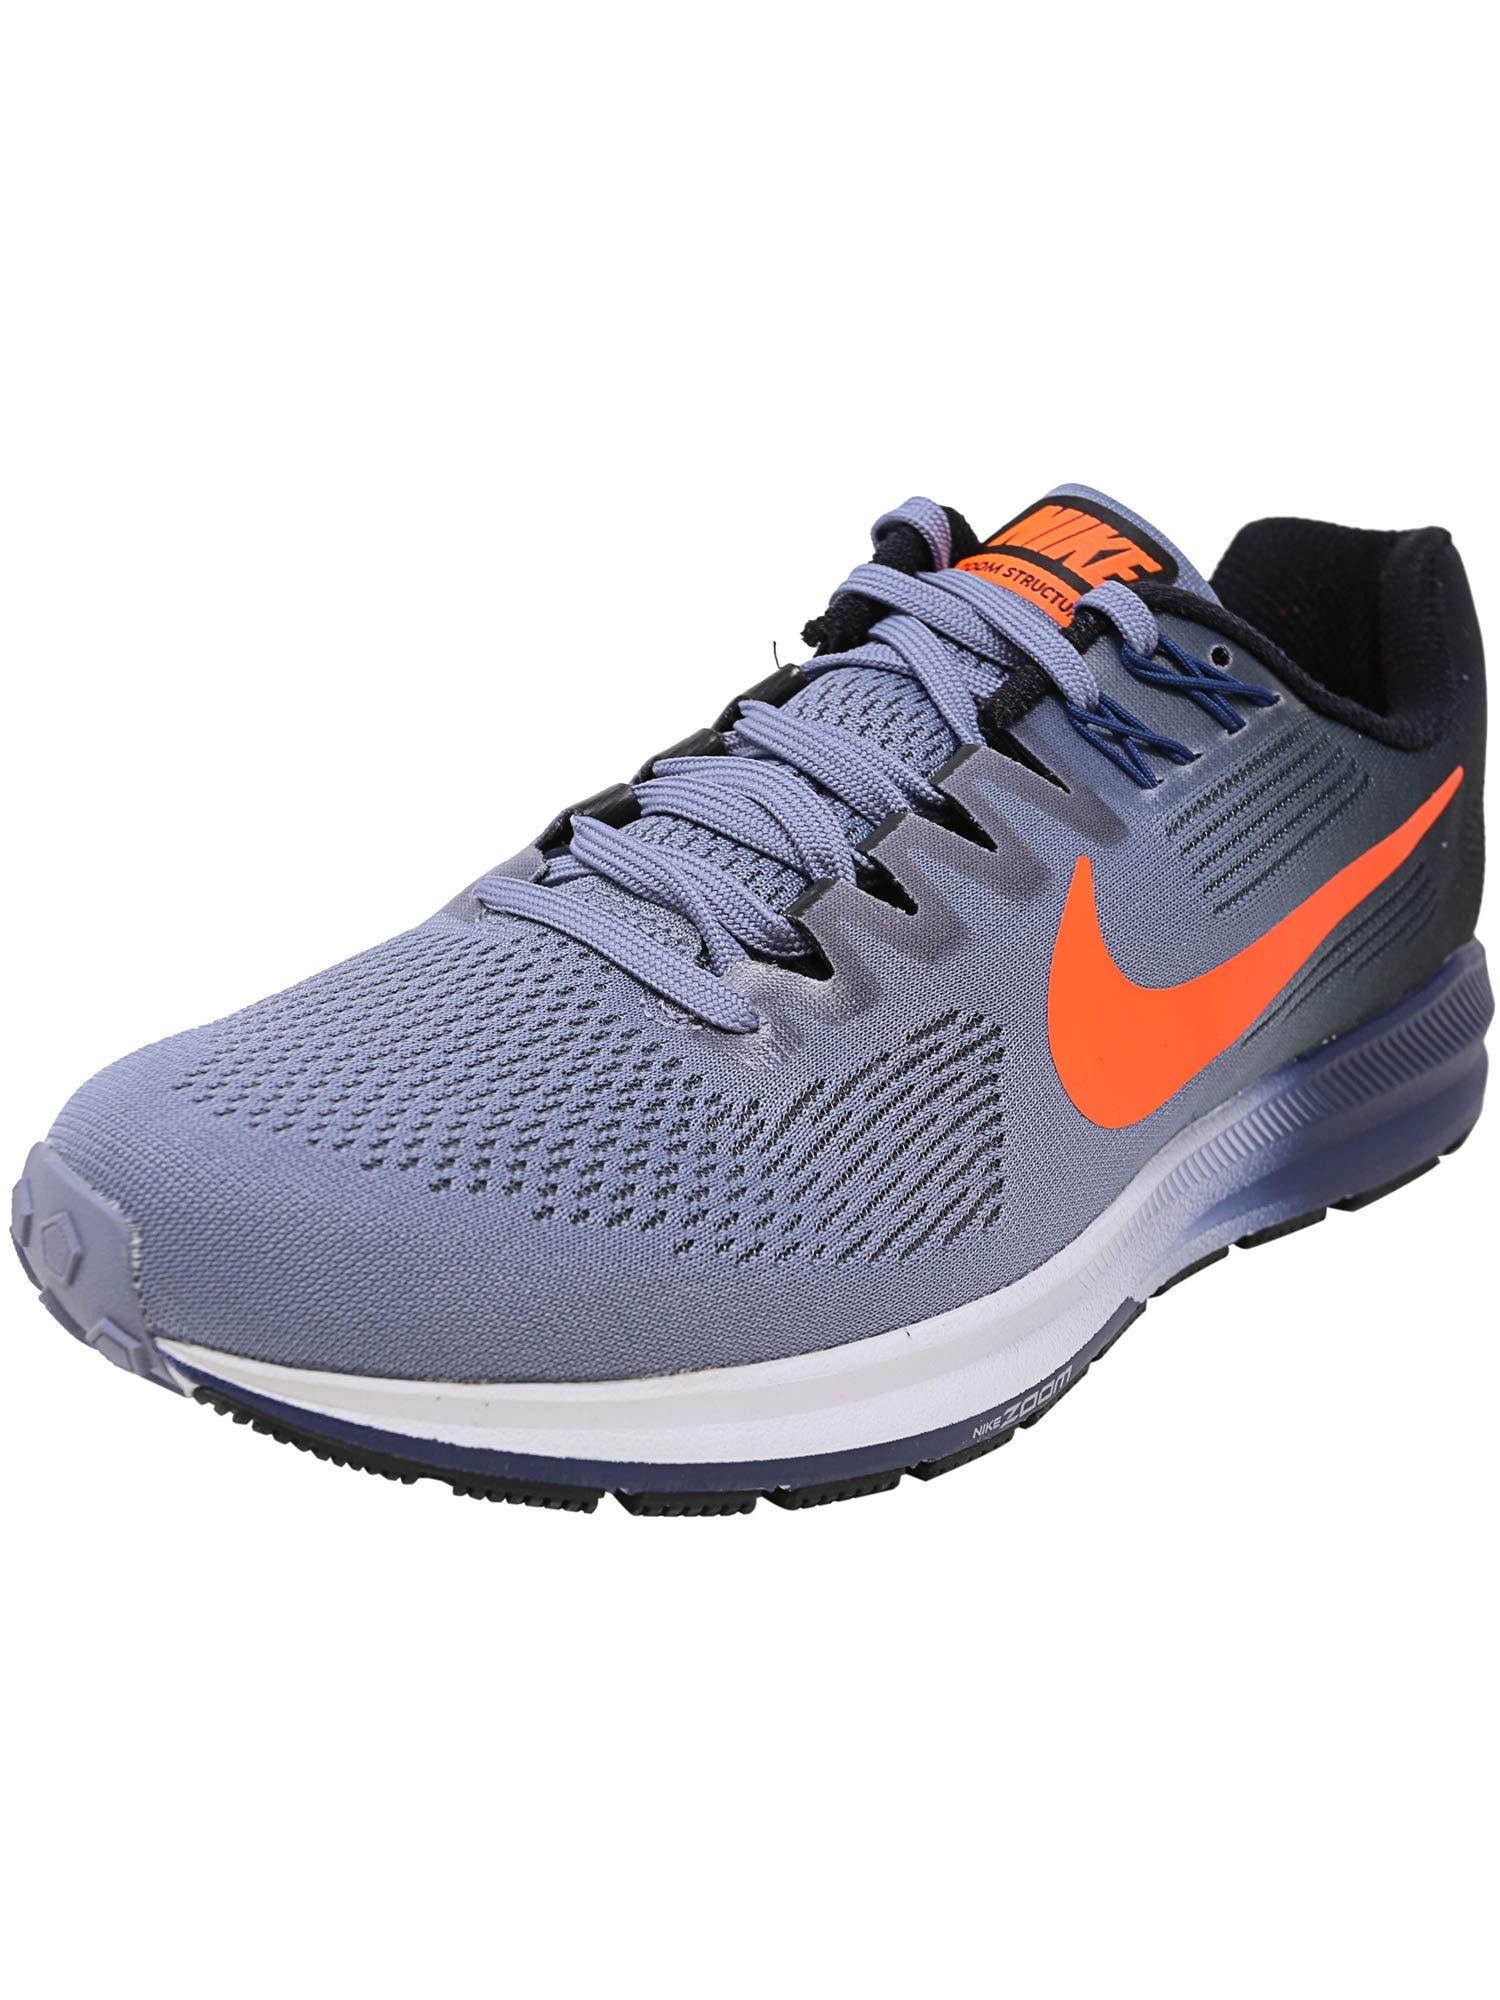 216899cea777 Galleon - Nike Men's Air Zoom Structure 21 Running Shoe Dark Sky Blue/Total  Crimson-Black-Navy 10.5